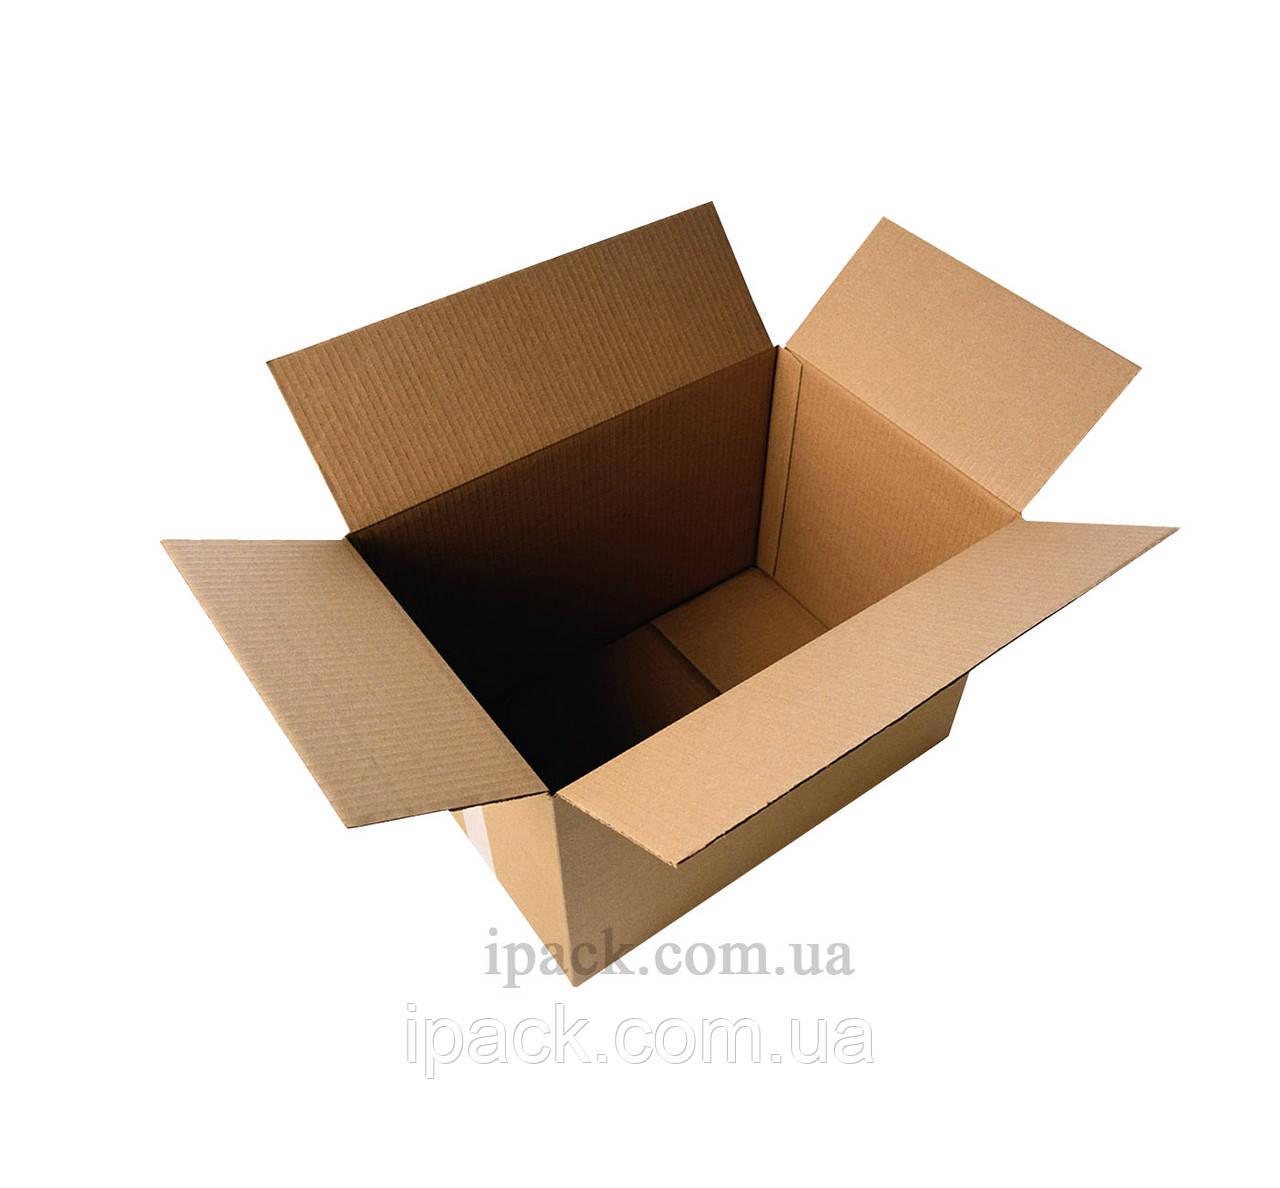 Гофроящик 410*275*310 мм, бурый, четырехклапанный картонный короб